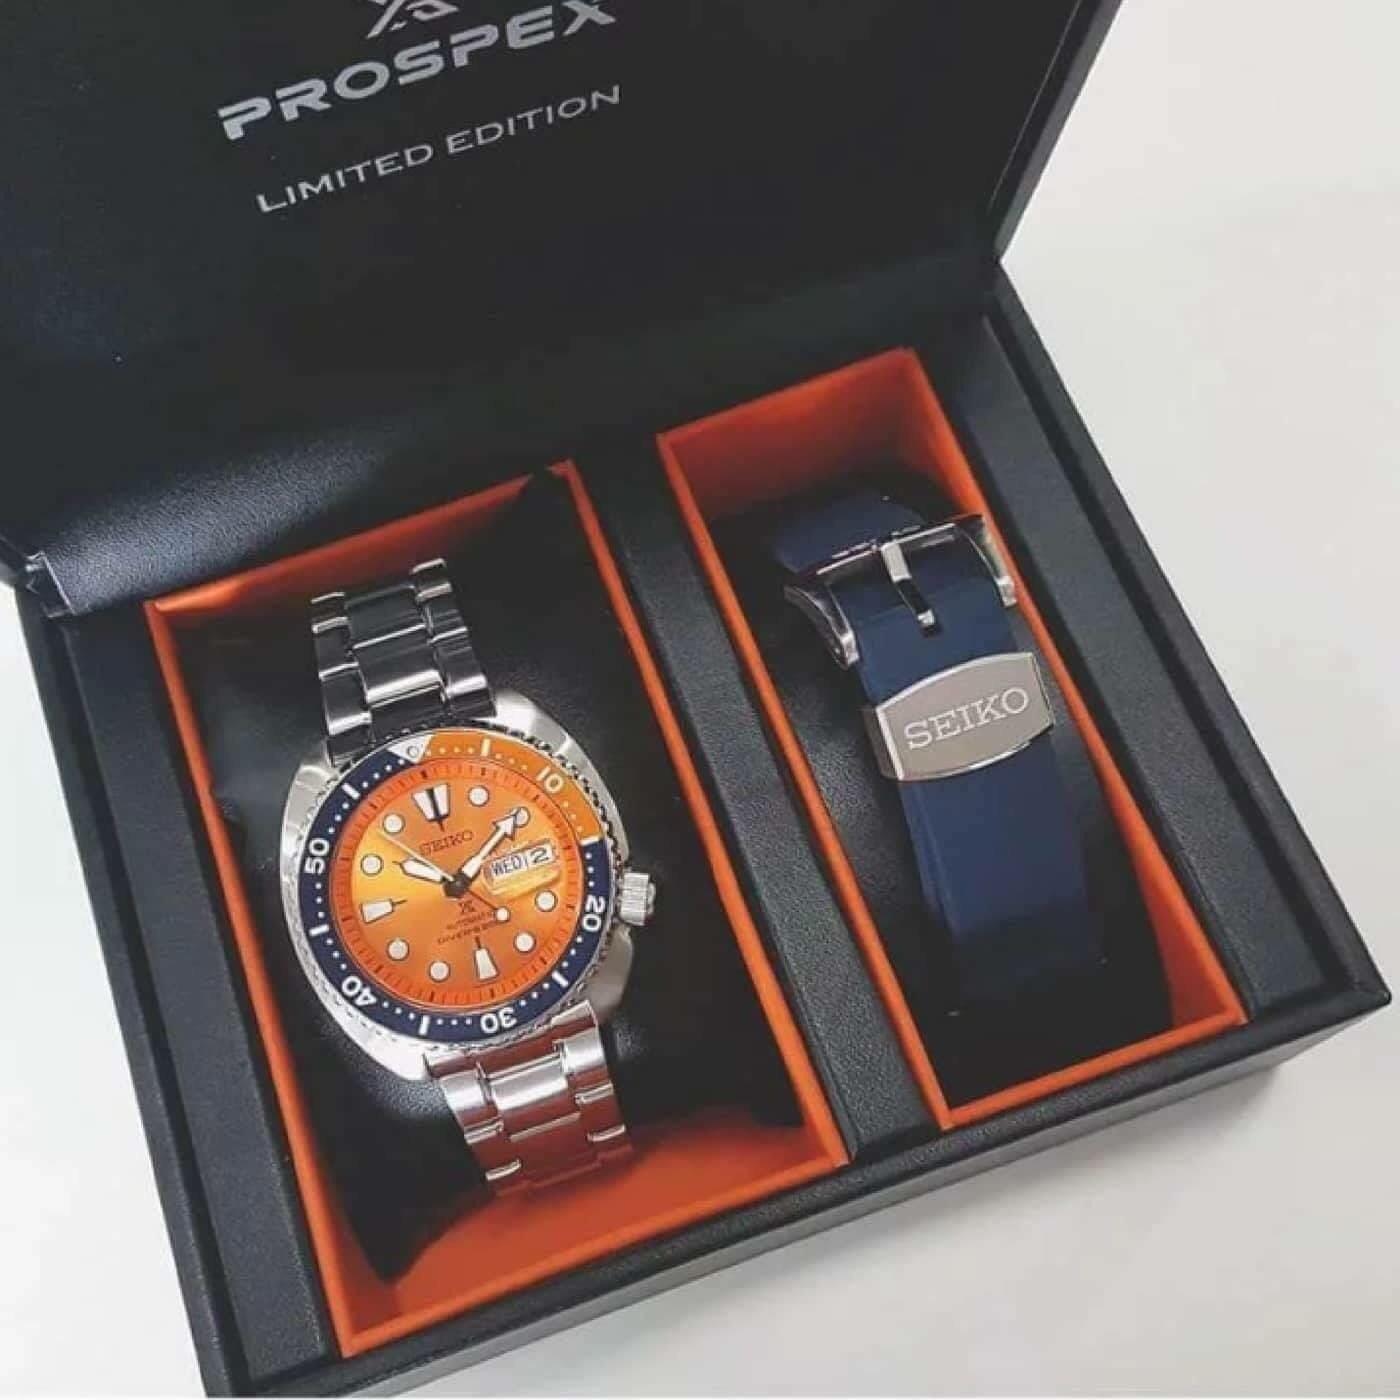 finest selection bb882 4dba7 Seiko Men Orange Turtle Limited Edition SRPC95K1 Watch